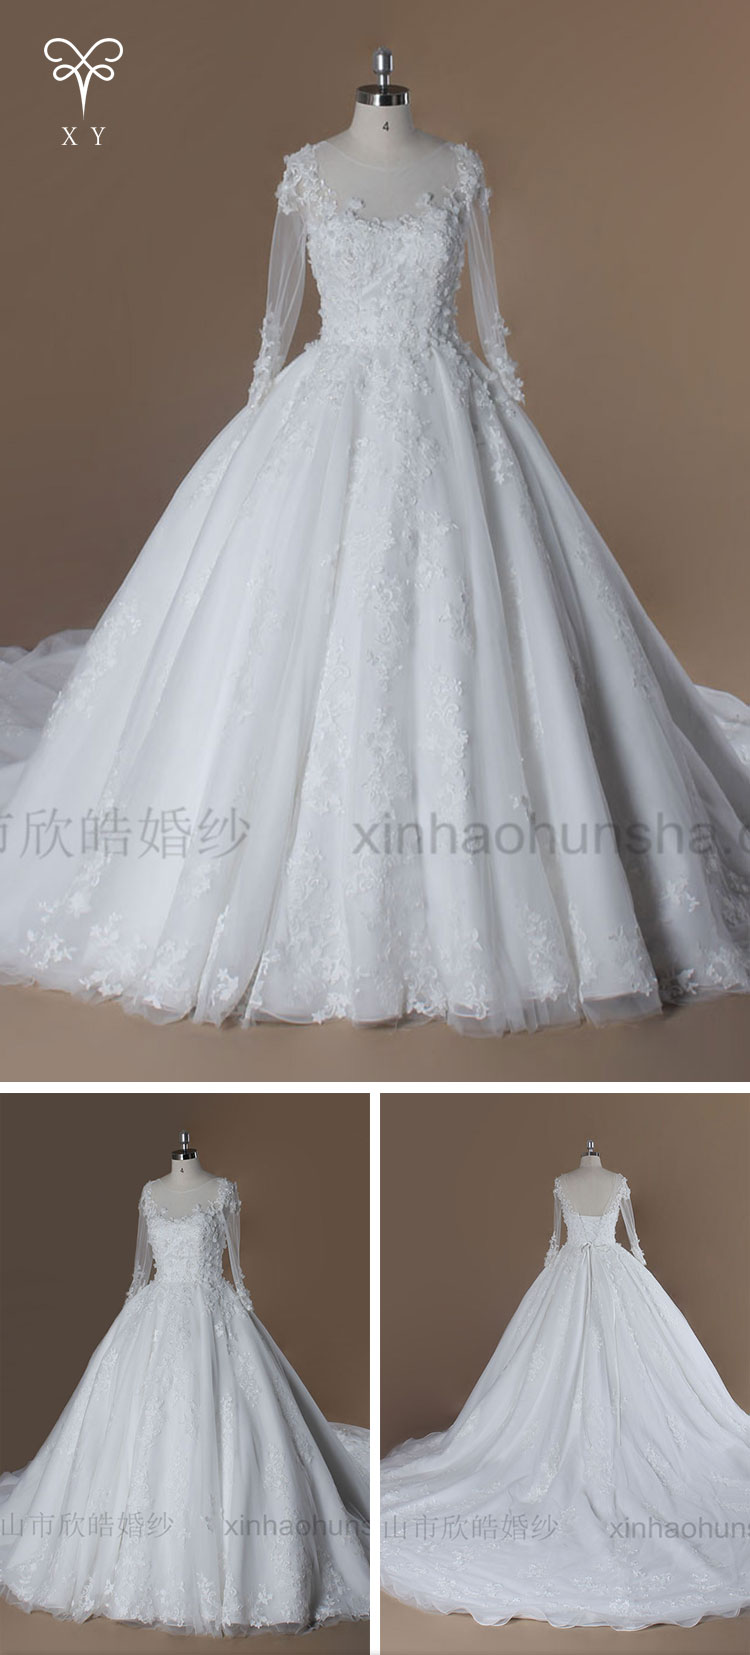 Good Price Latest Wedding Gown In 2016 Wedding Dress Patterns - Buy ...